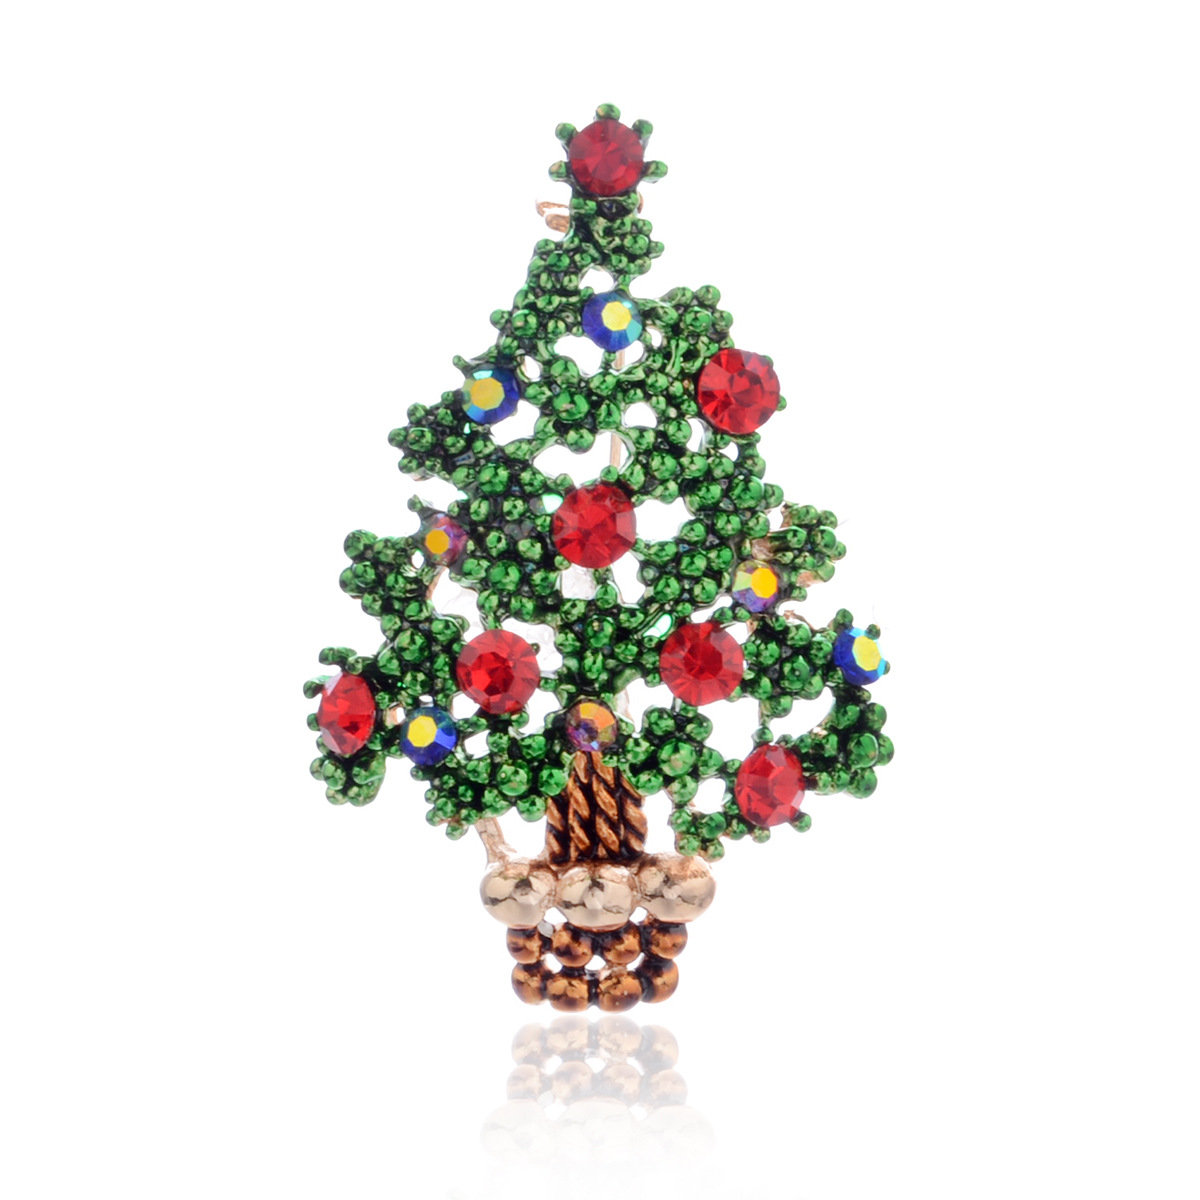 Trendy Metal Green Christmas Tree Brooch Geometric Rhinestone Tree Brooch Chic Jewelry